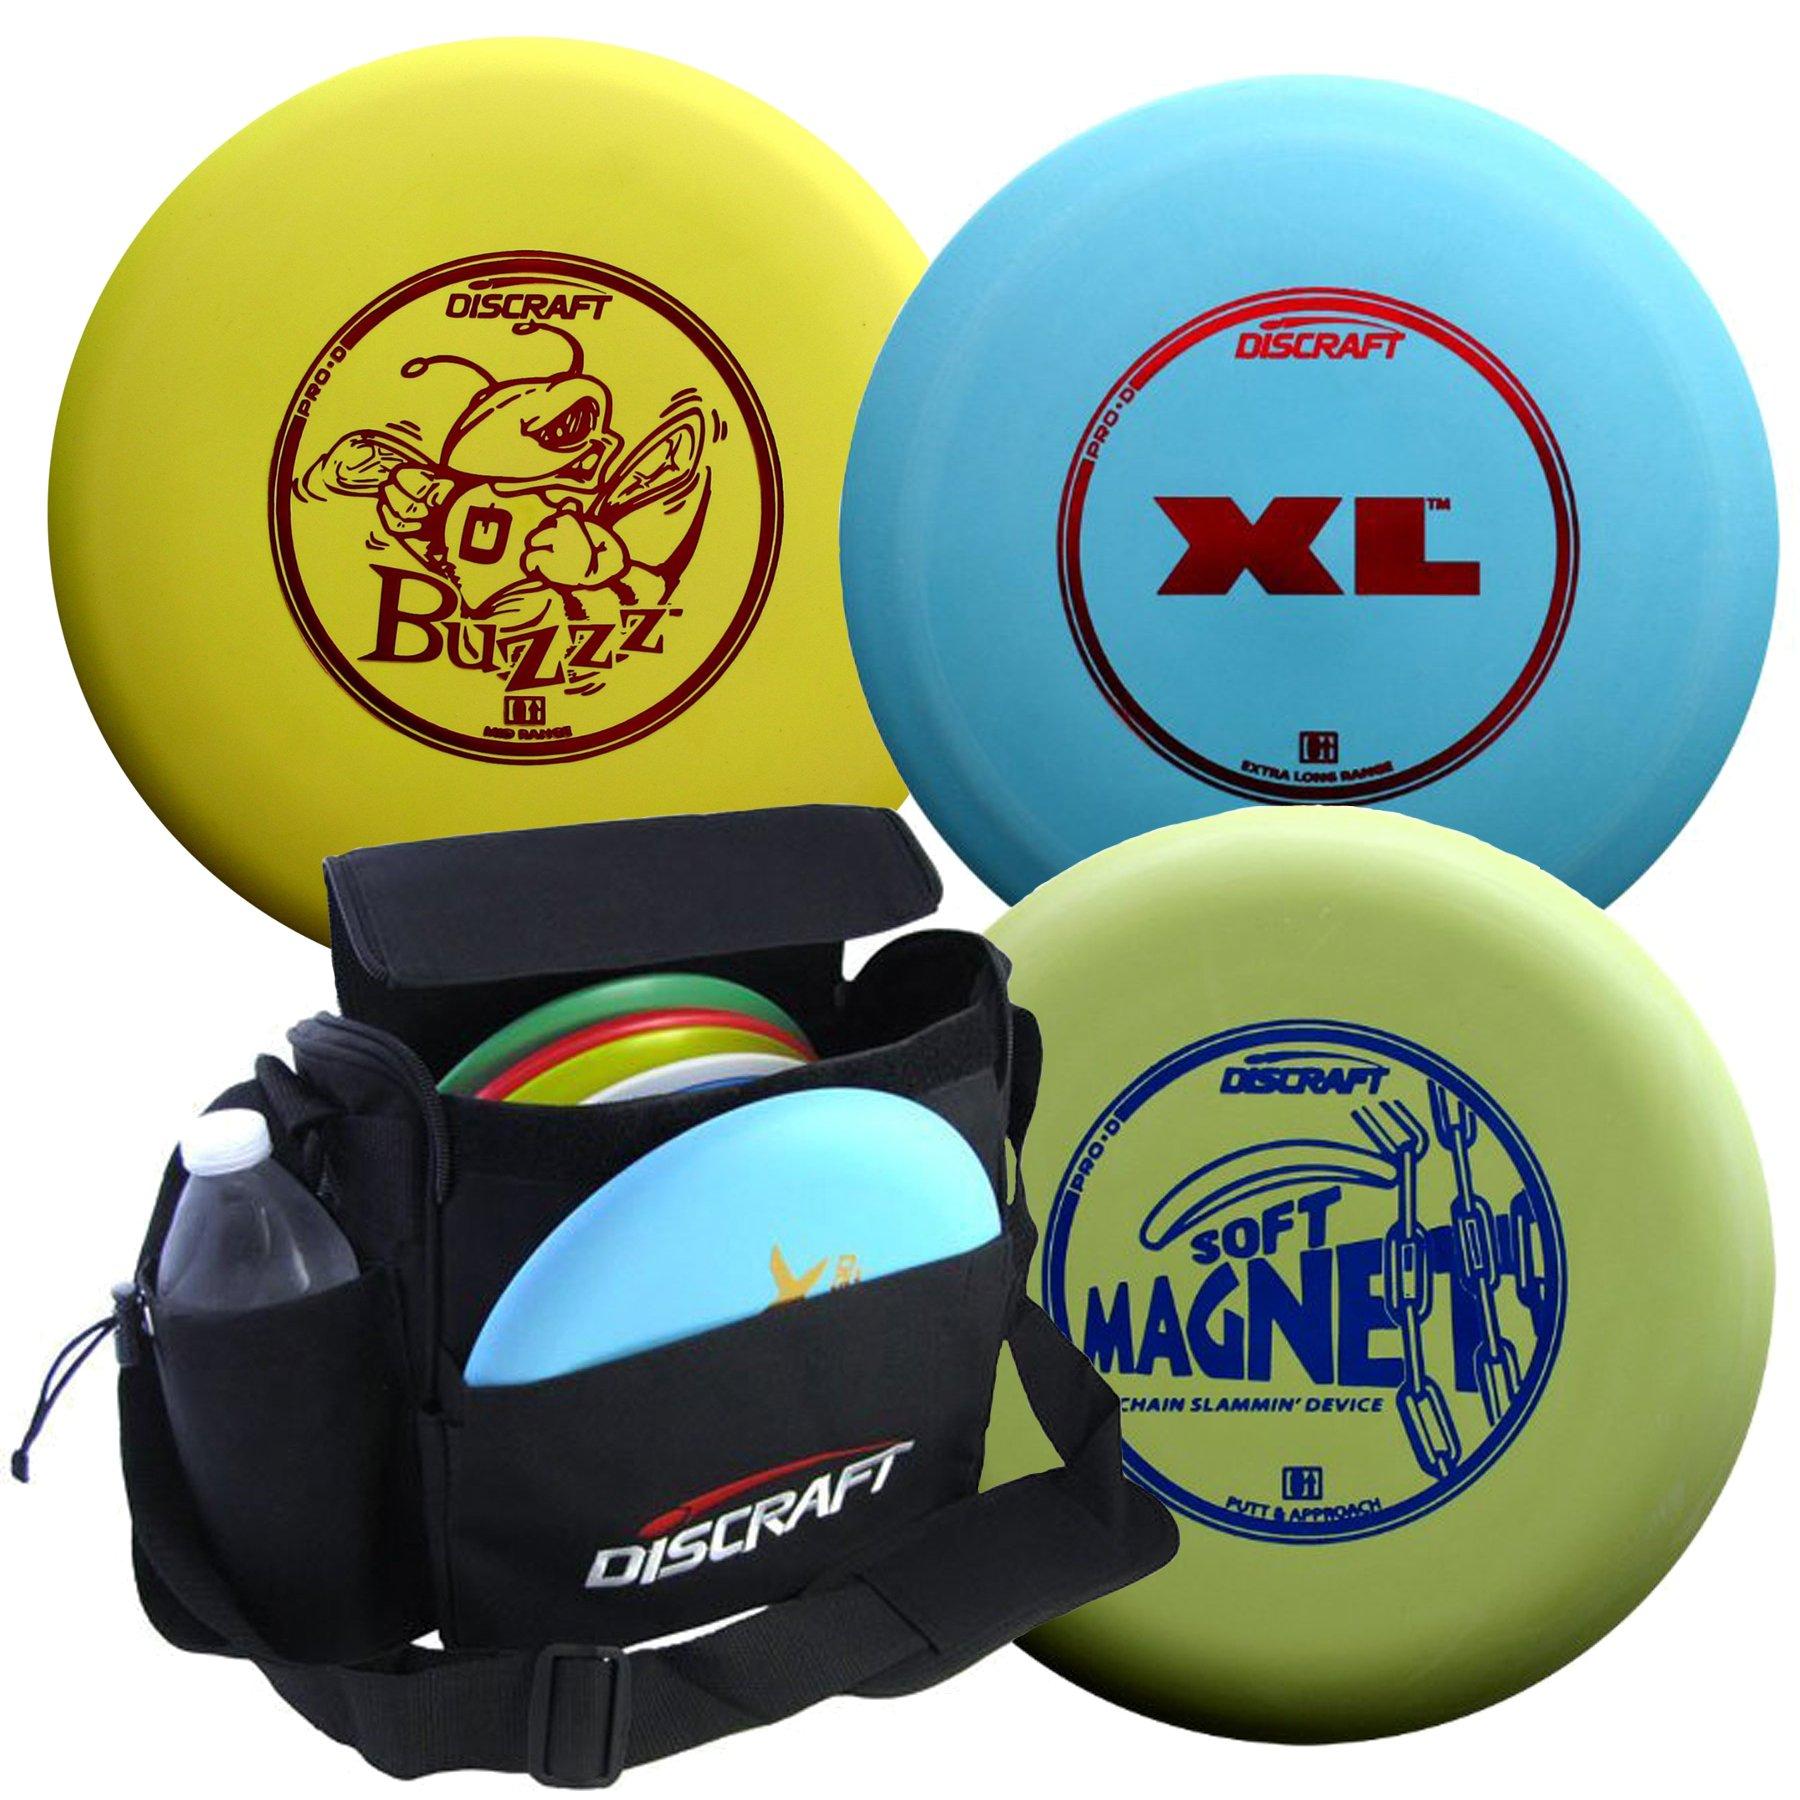 Discraft Disc Golf Pro-D Starter Package by Discraft